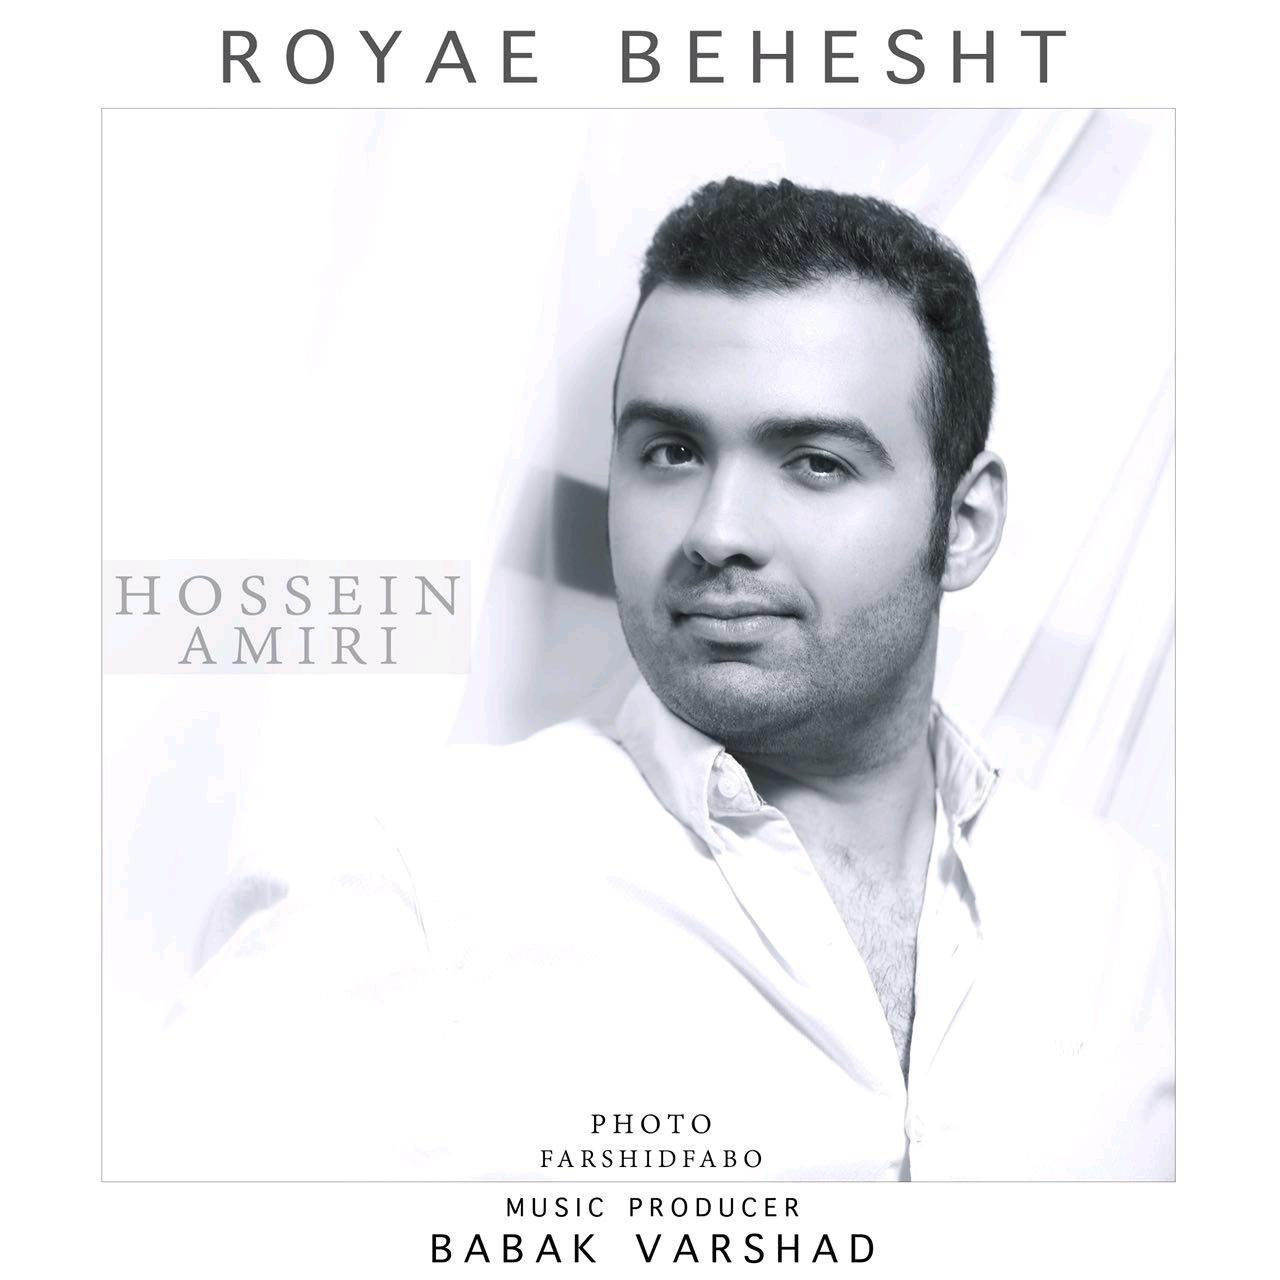 Hossein Amiri – Aoyae Behesht